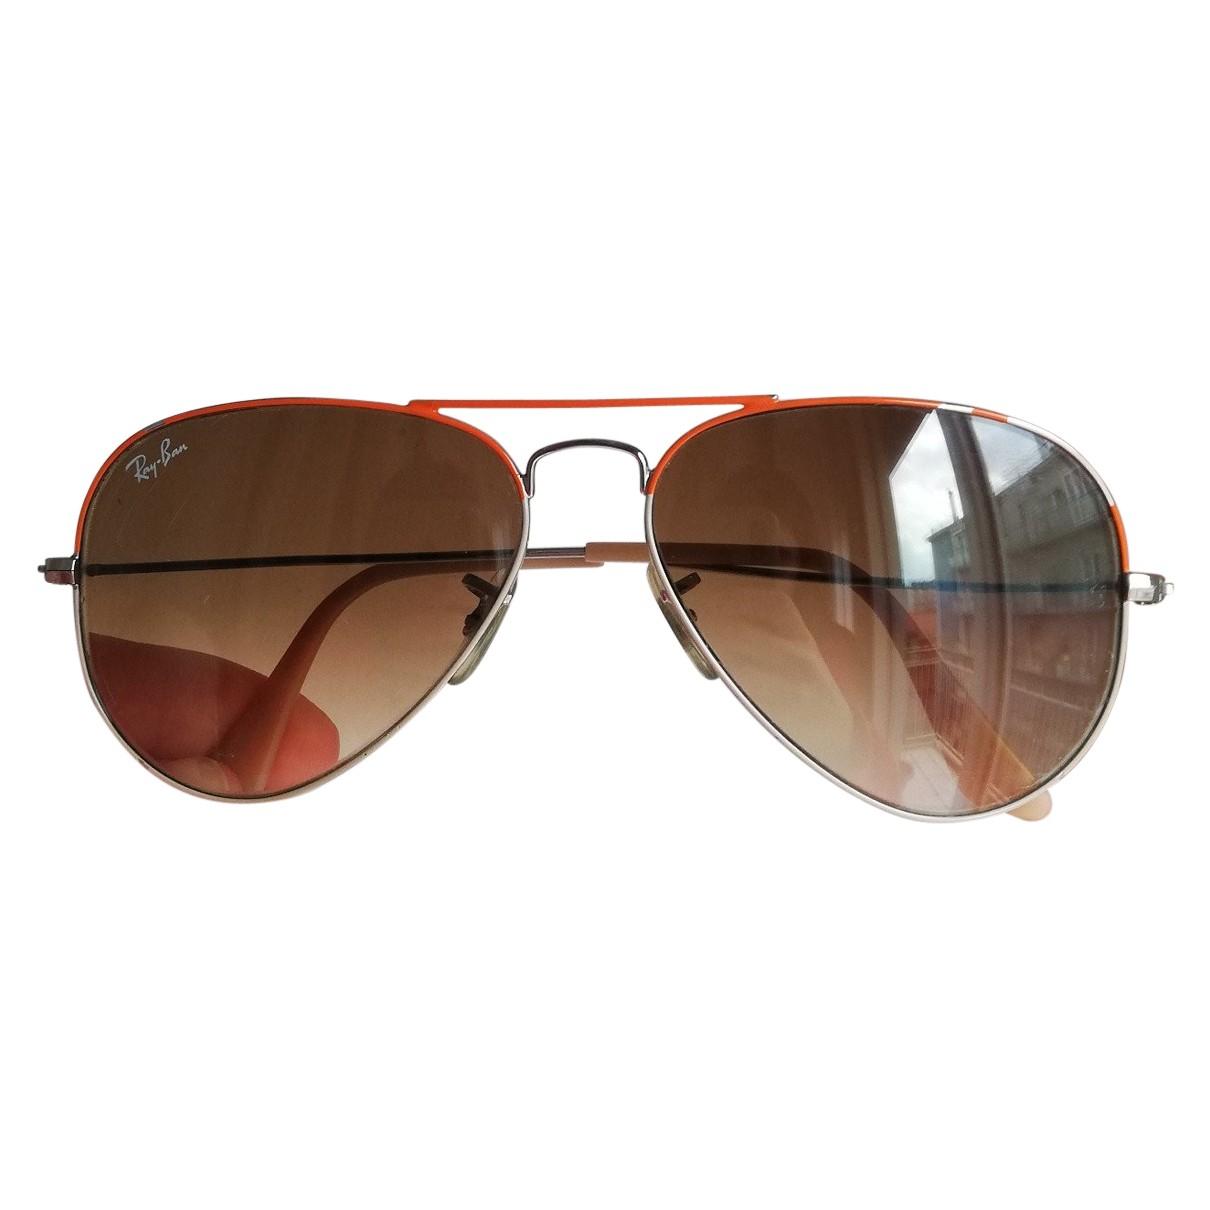 Ray-ban Aviator Orange Metal Sunglasses for Women N